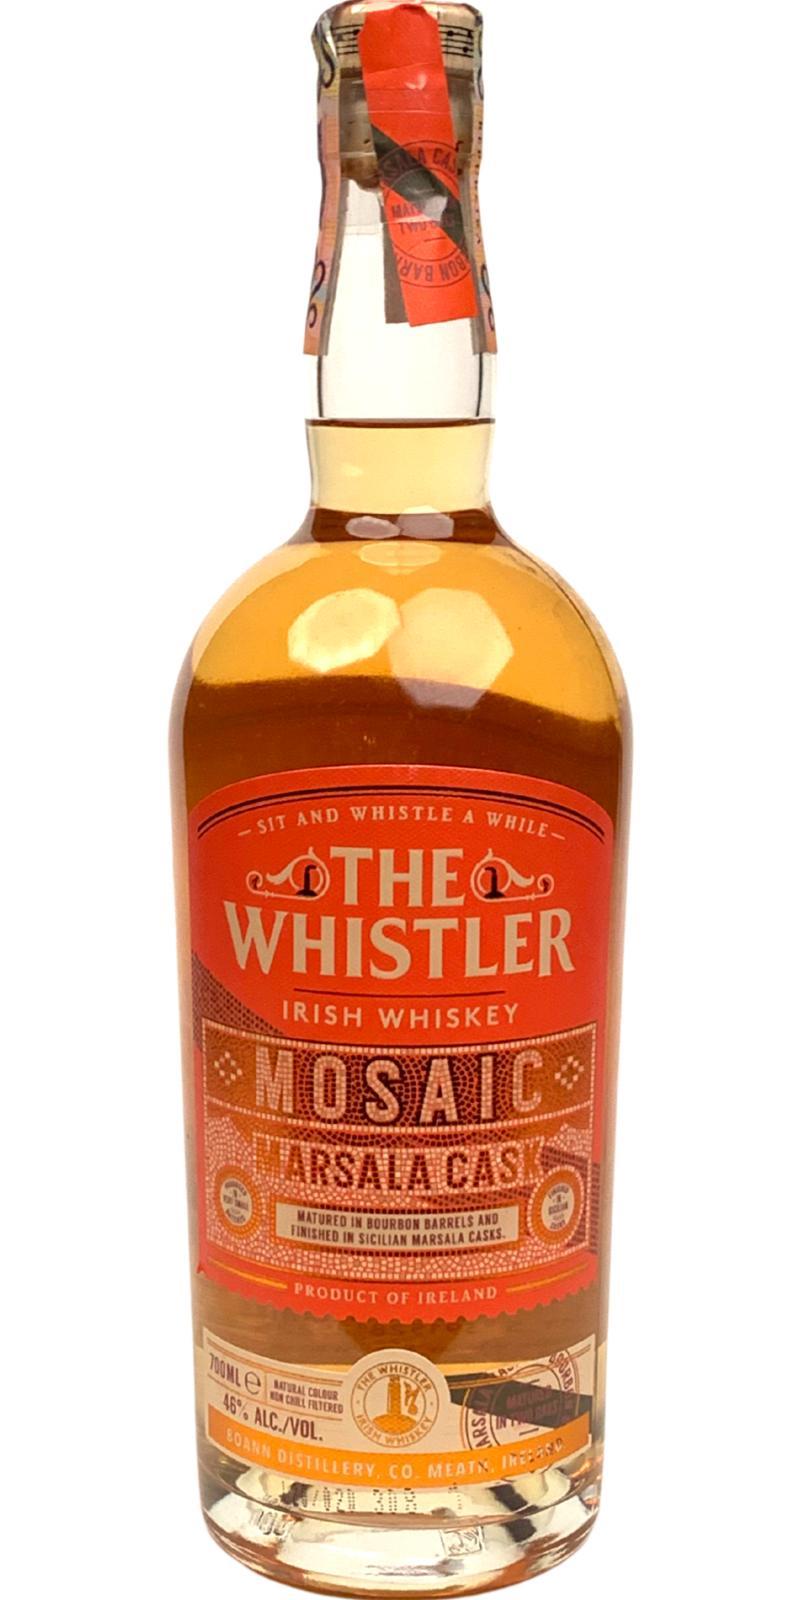 The Whistler Mosaic BoD